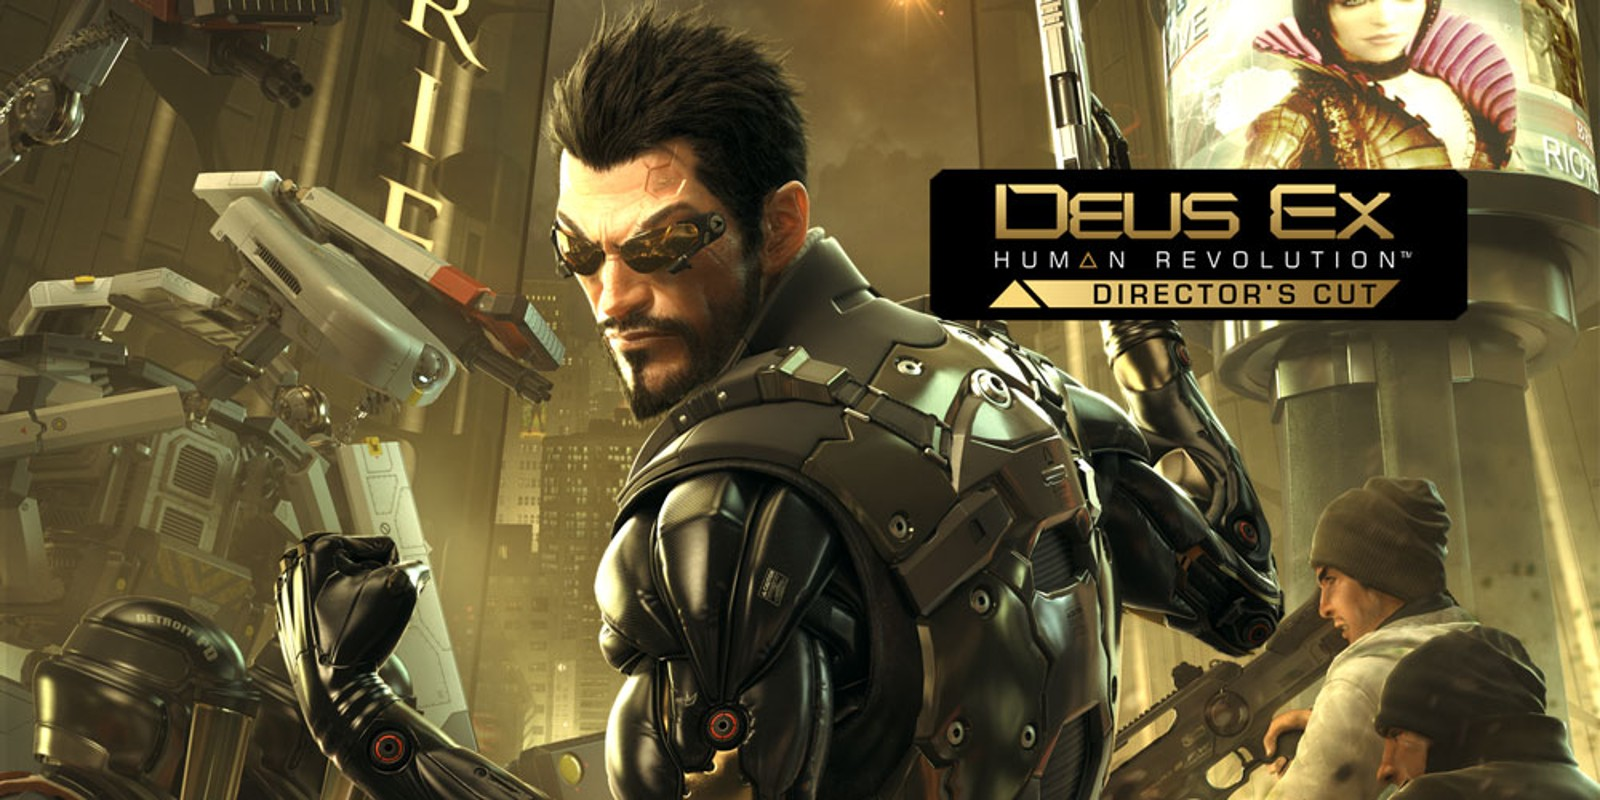 Deus Ex: Human Revolution – Director's Cut | Wii U | Games | Nintendo